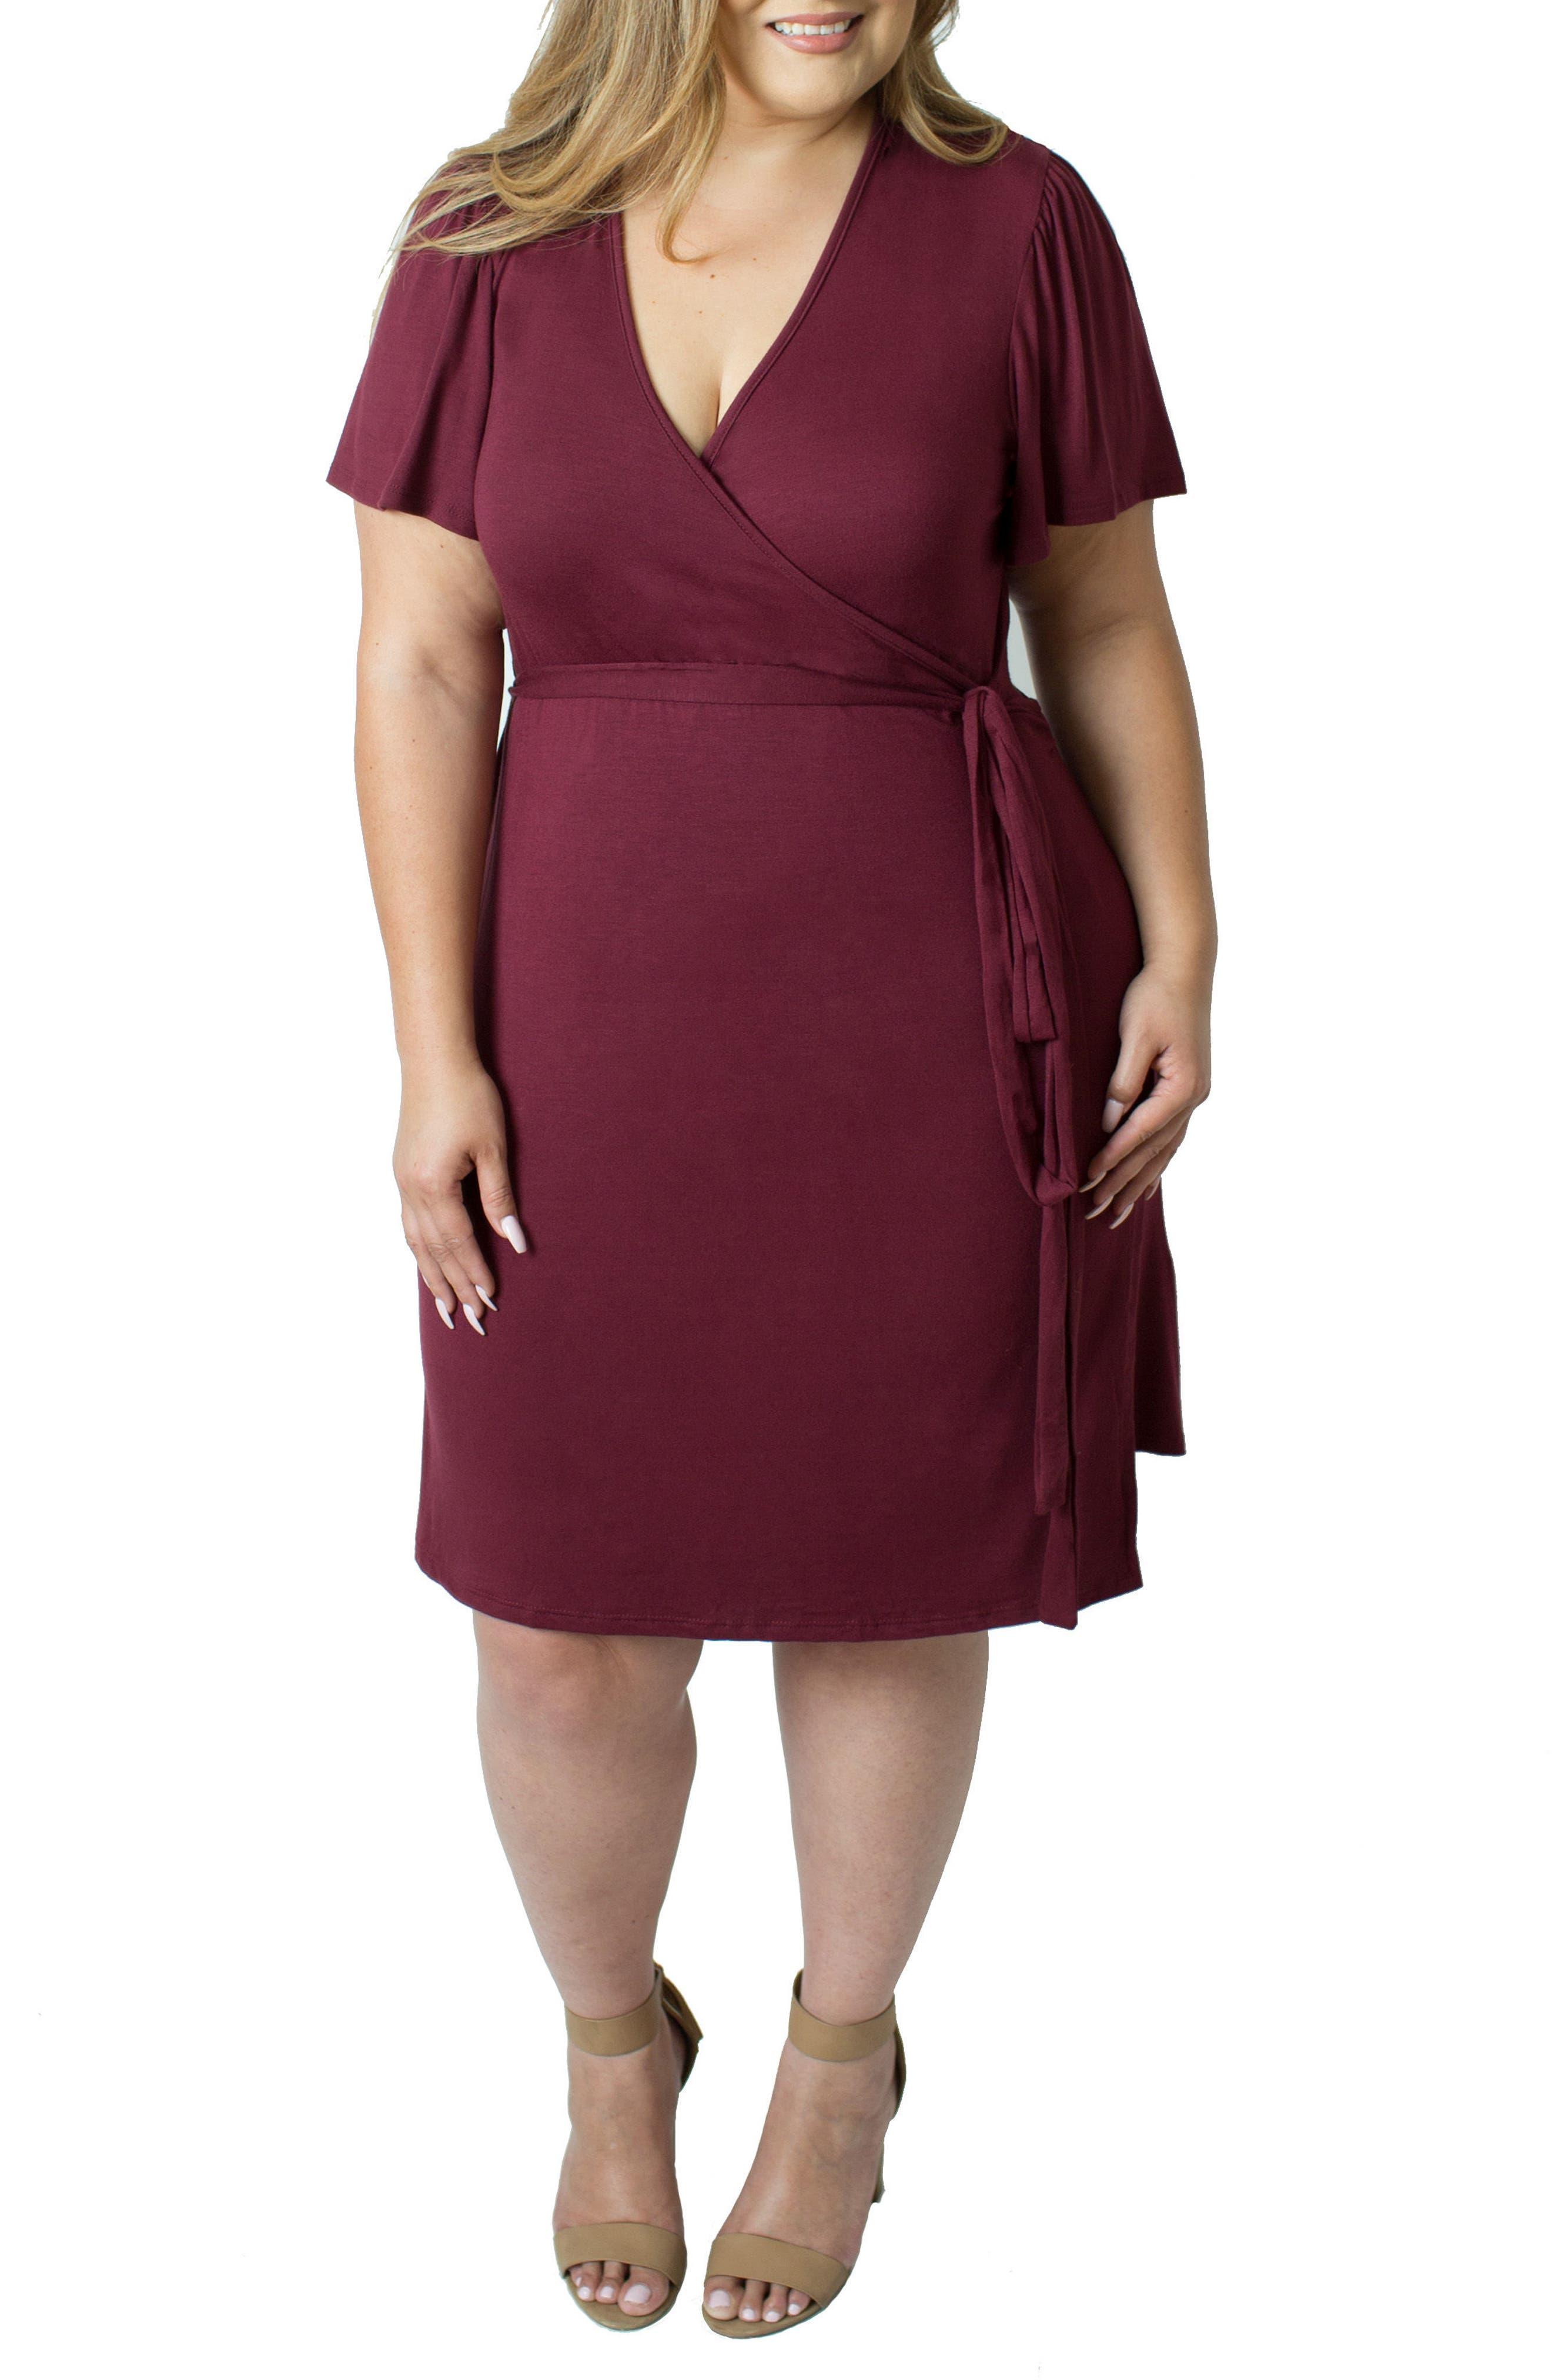 Wrap Nursing Dress,                         Main,                         color, Red